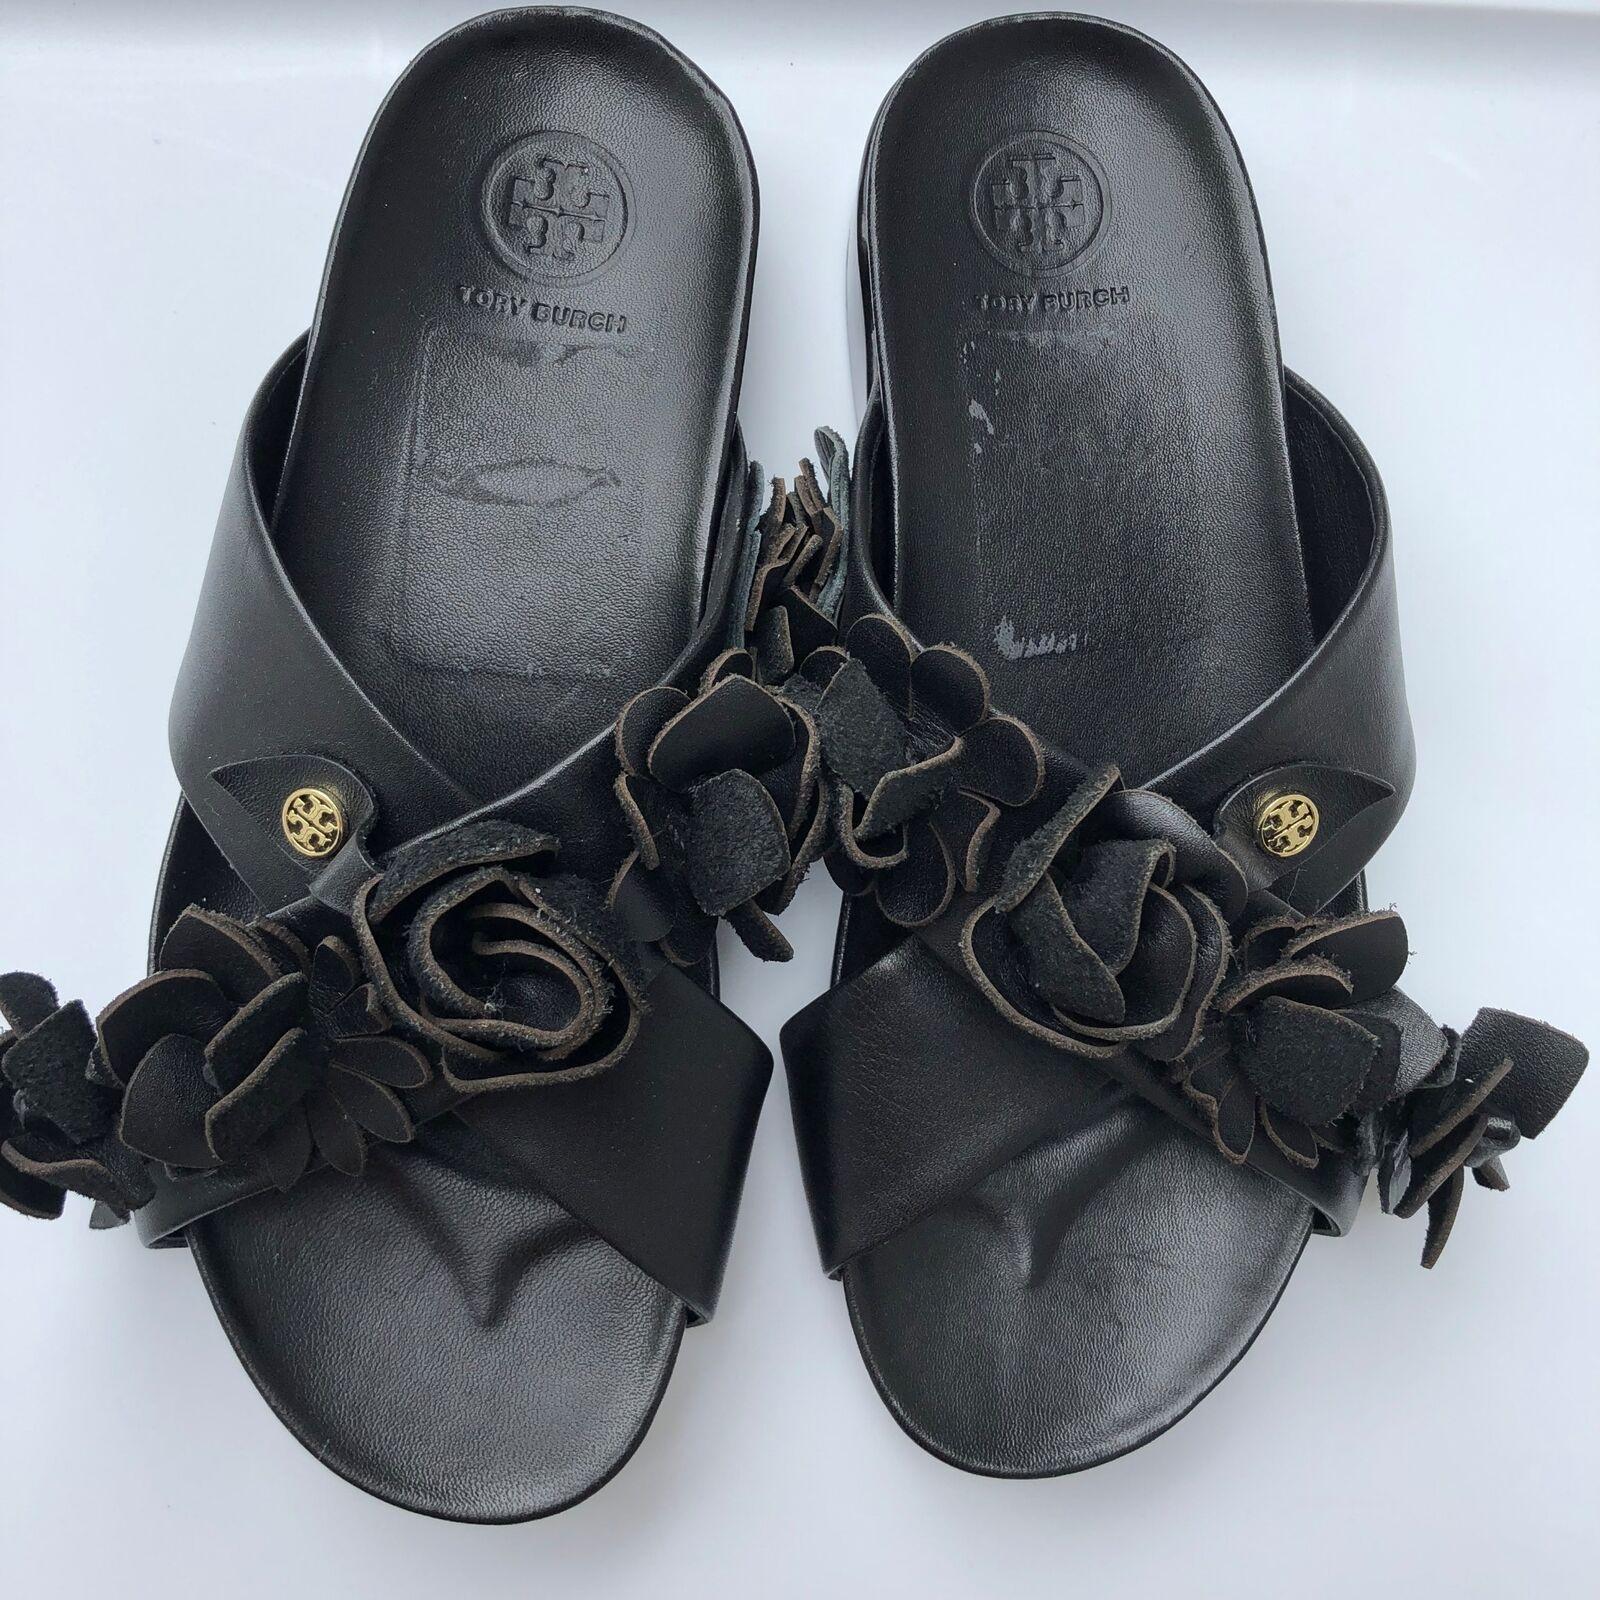 Tory Burch Mujer Sandalias Ojotas de pisos Floral Negro Tamaño Tamaño Tamaño 7M  venta caliente